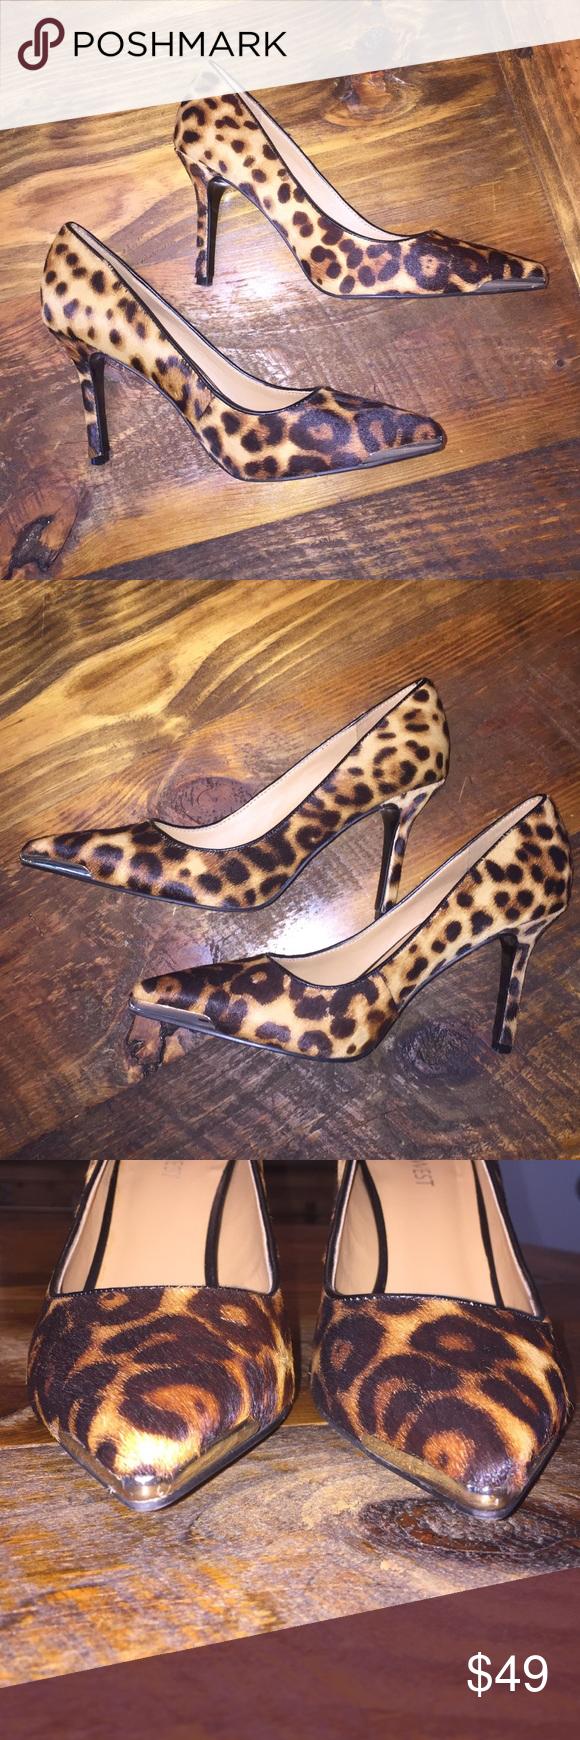 "Nine West leopard print pumps 7.5 Nine West leopard print pumps. Size 7.5. Worn one time. Metal pointed toe. Heel height is 3.75"". Nine West Shoes Heels"